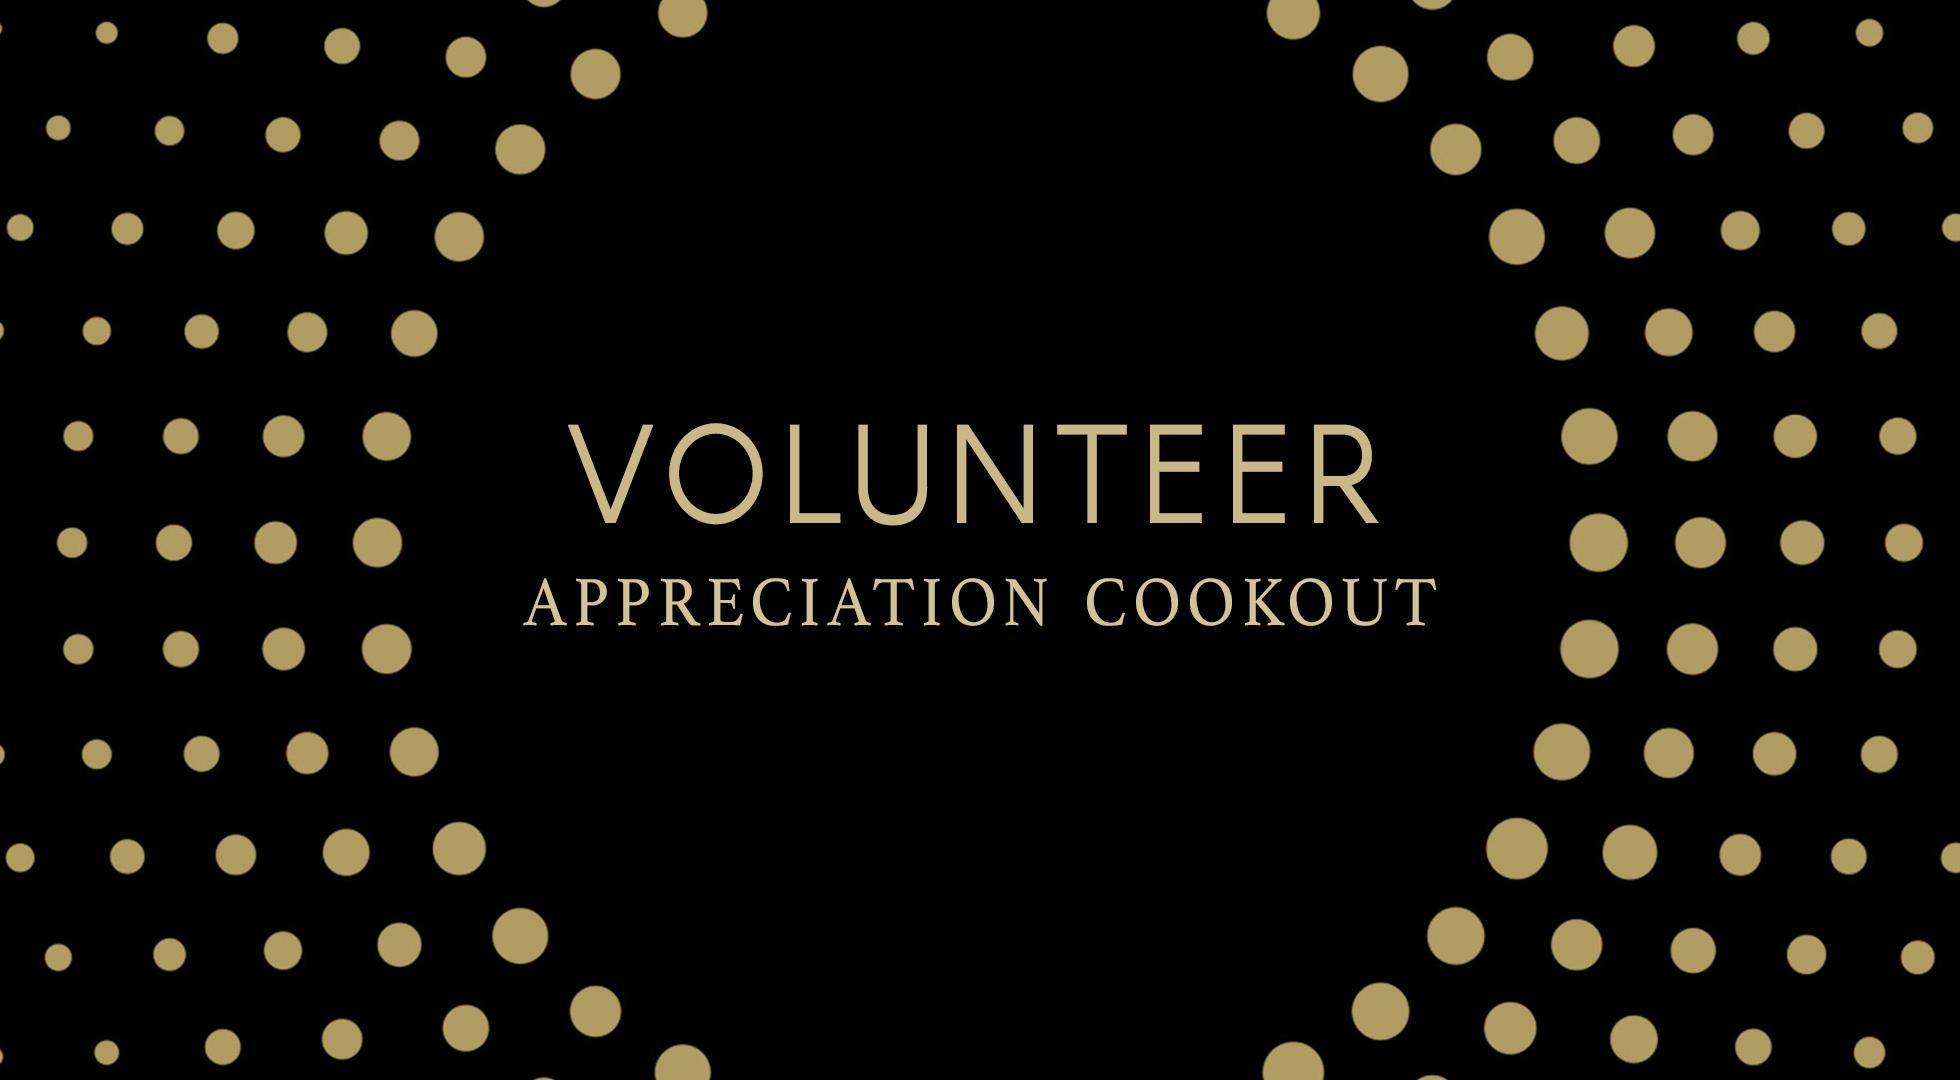 Vineyard-Church-Volunteer-Appreciation-Cookout.jpg